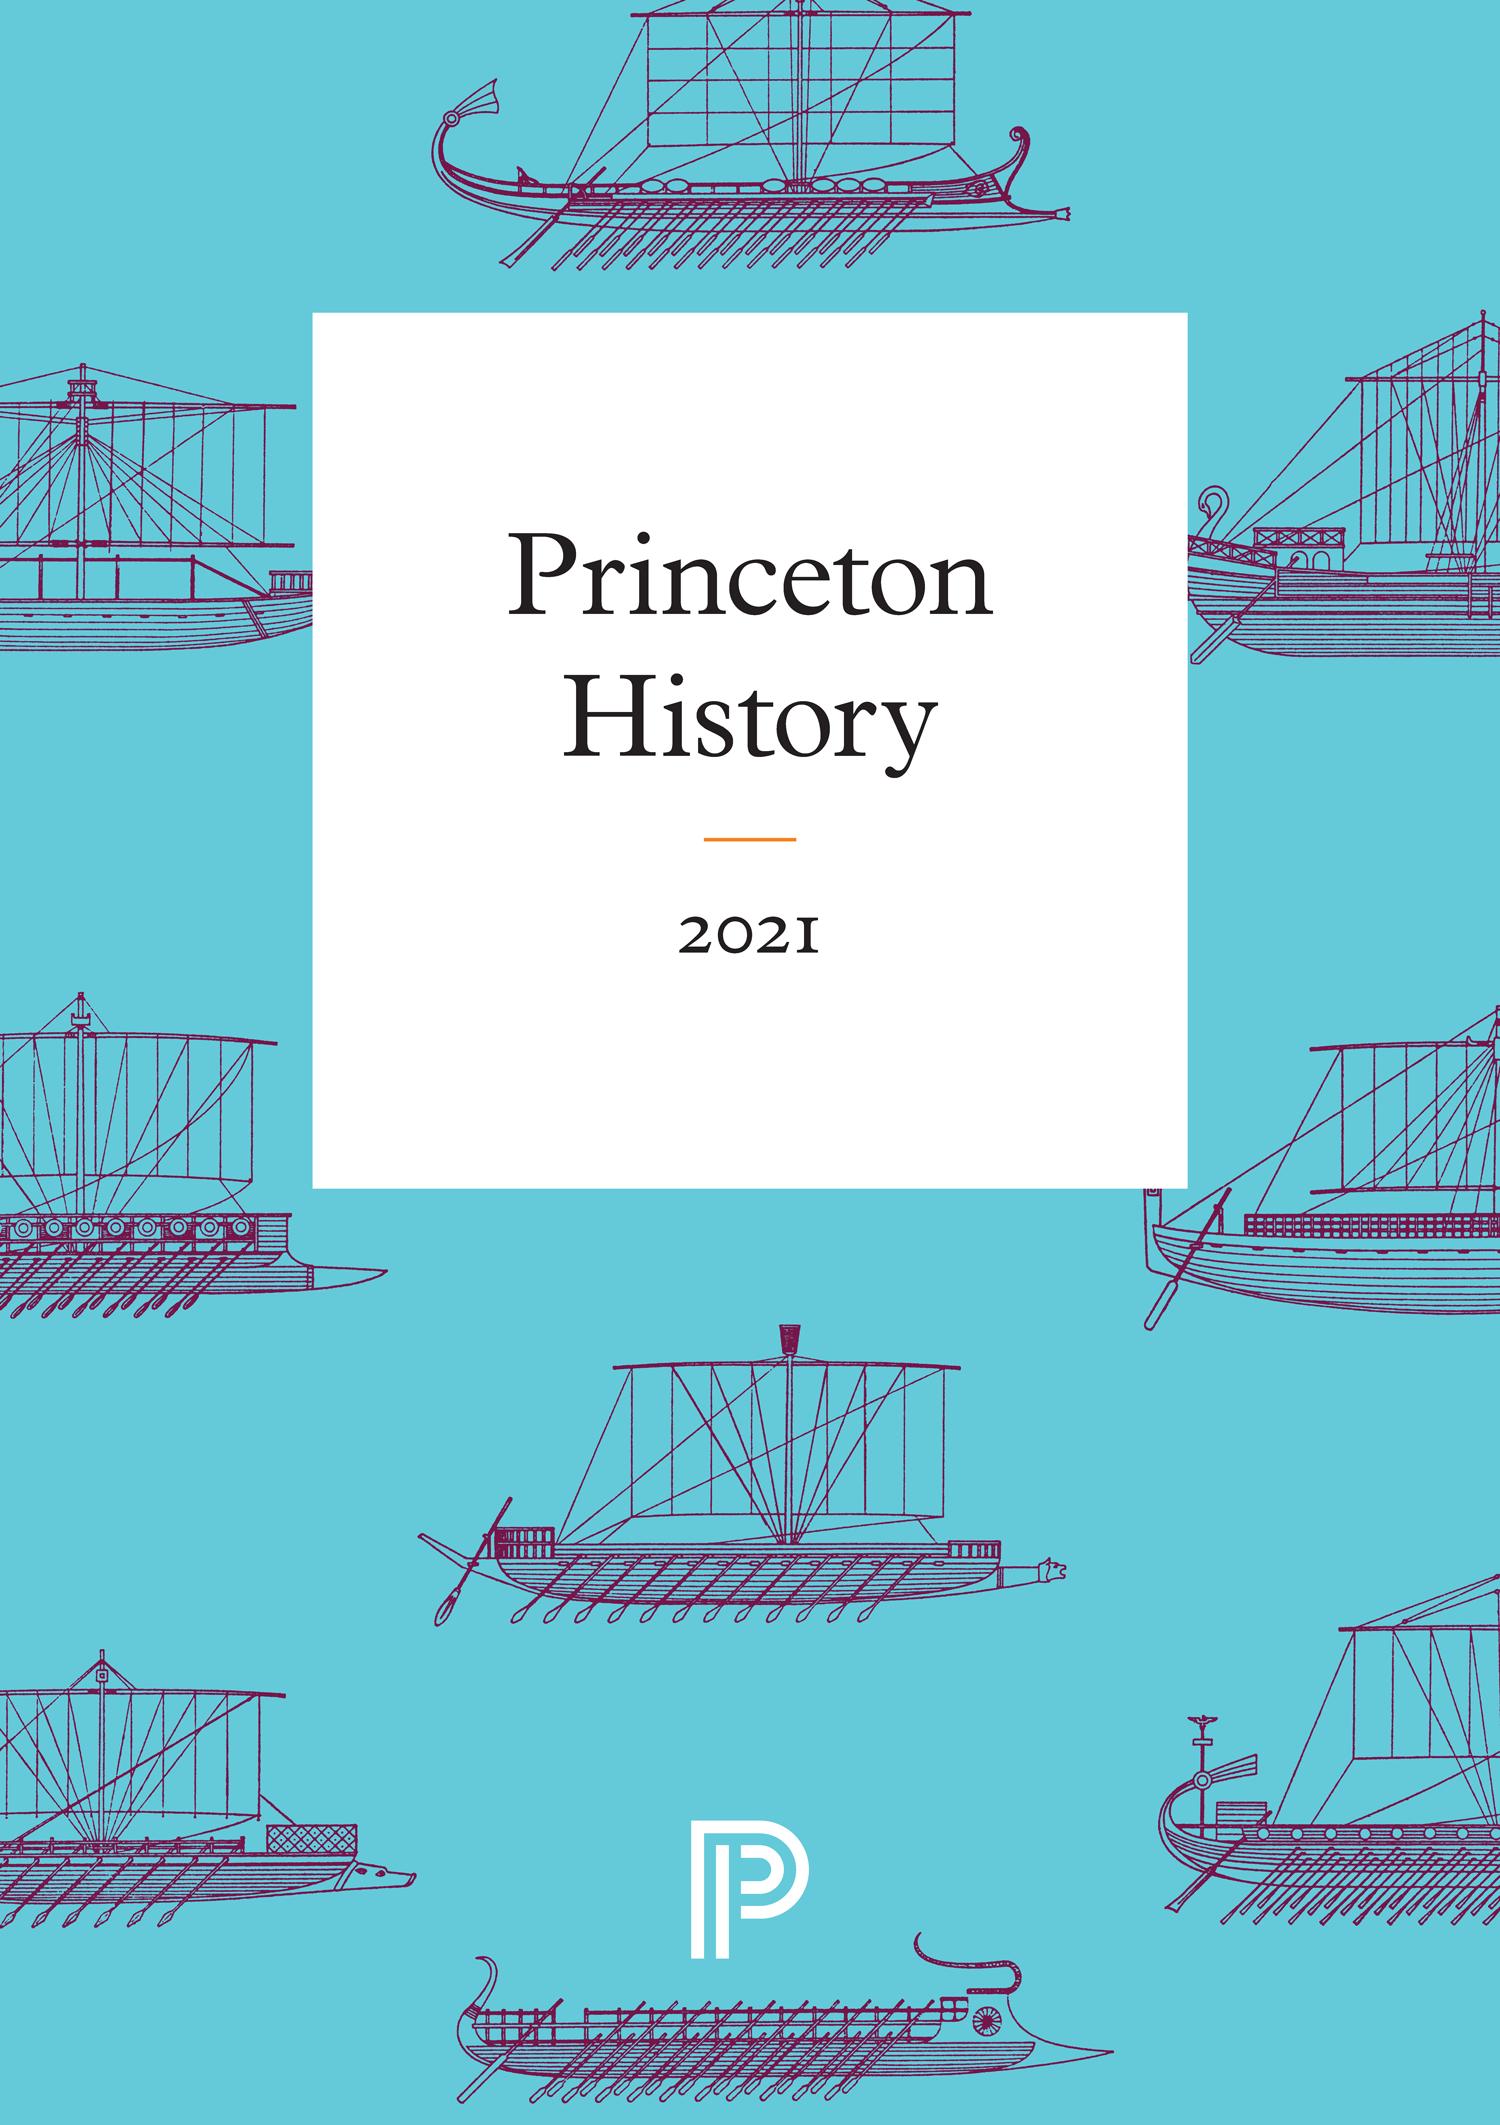 Princeton History 2021 catalog